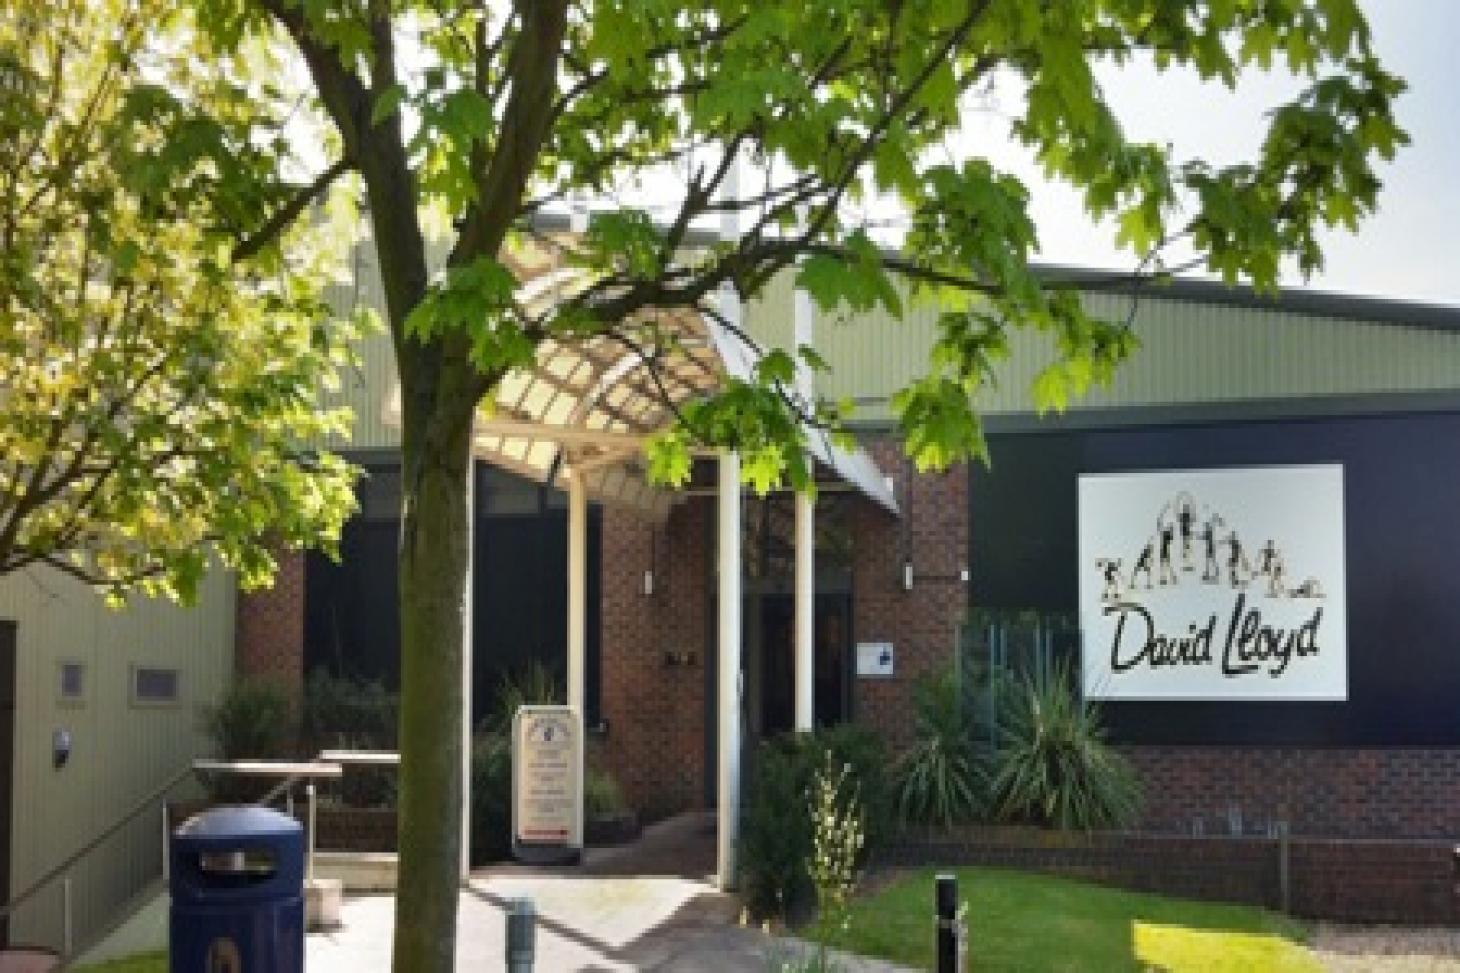 David Lloyds Raynes Park Indoor swimming pool